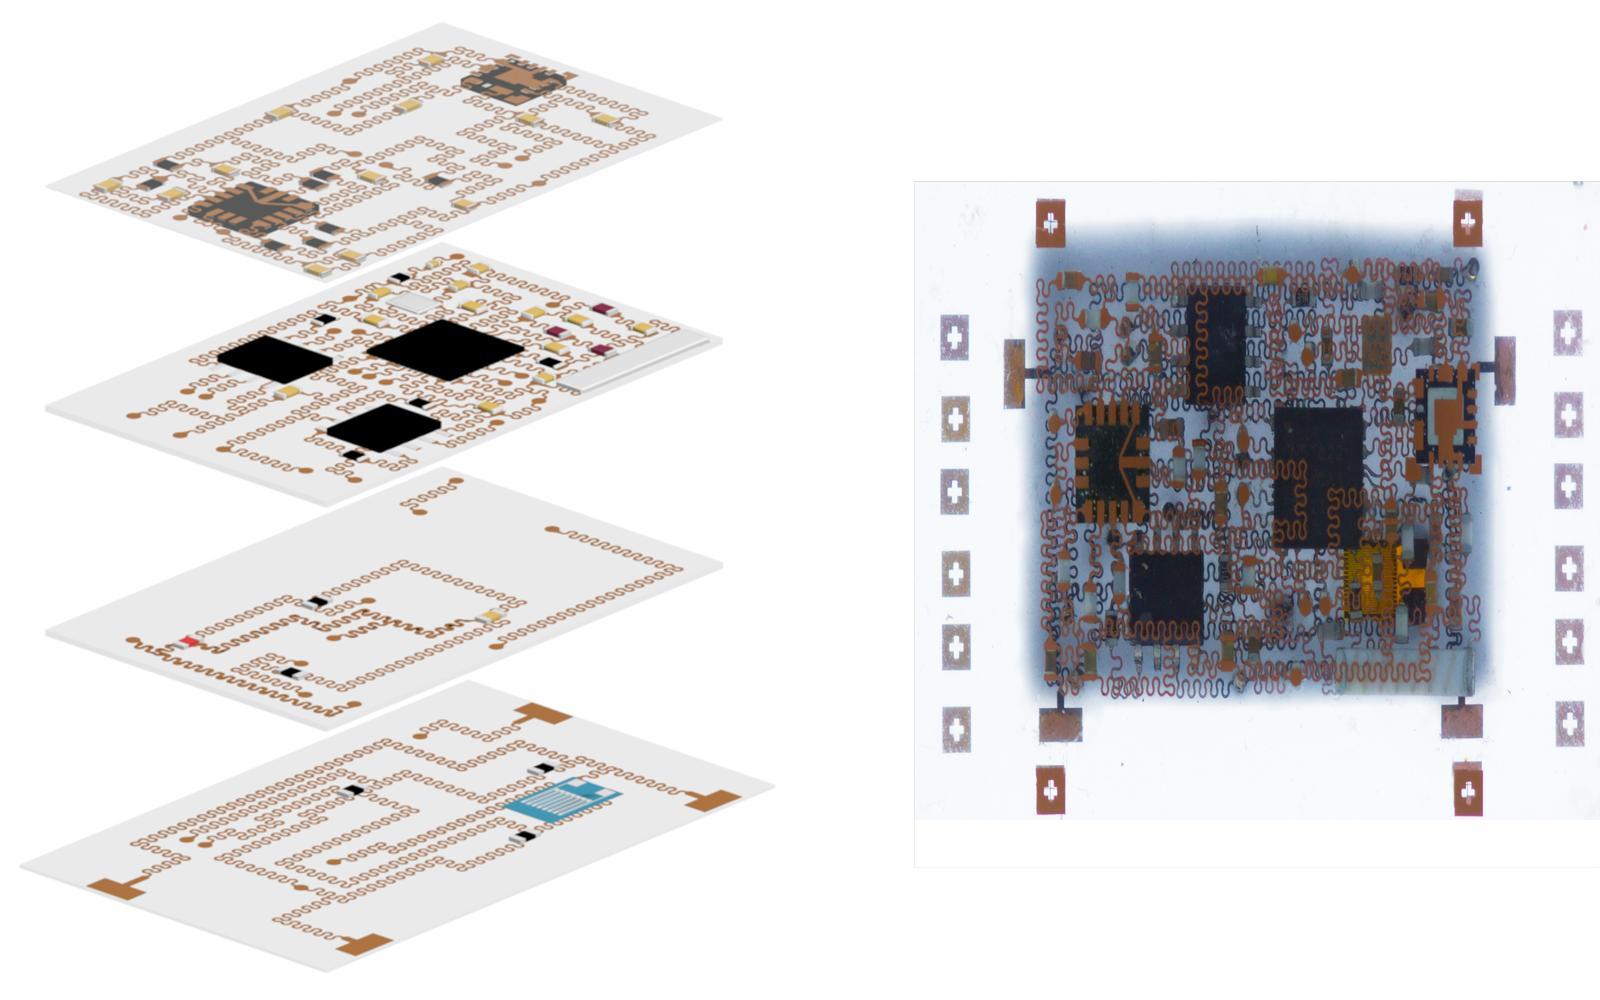 3D stretchable electronics